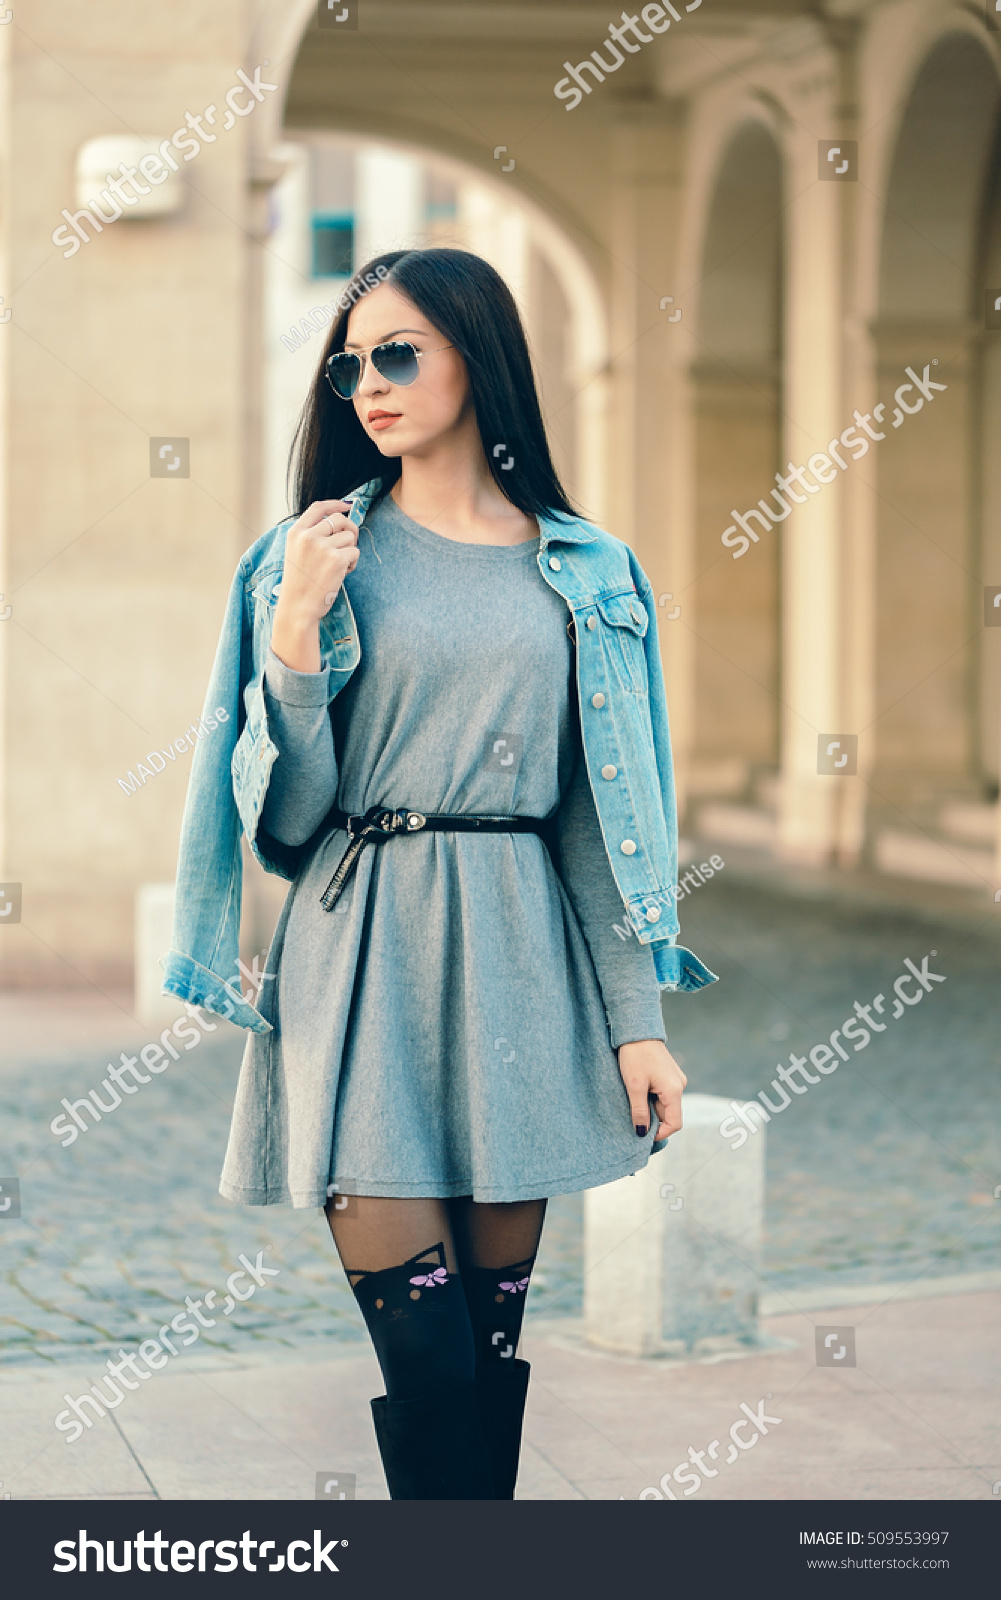 9fb711664480 Young Fashion Girl Style Denim Jacket Stock Photo (Edit Now ...